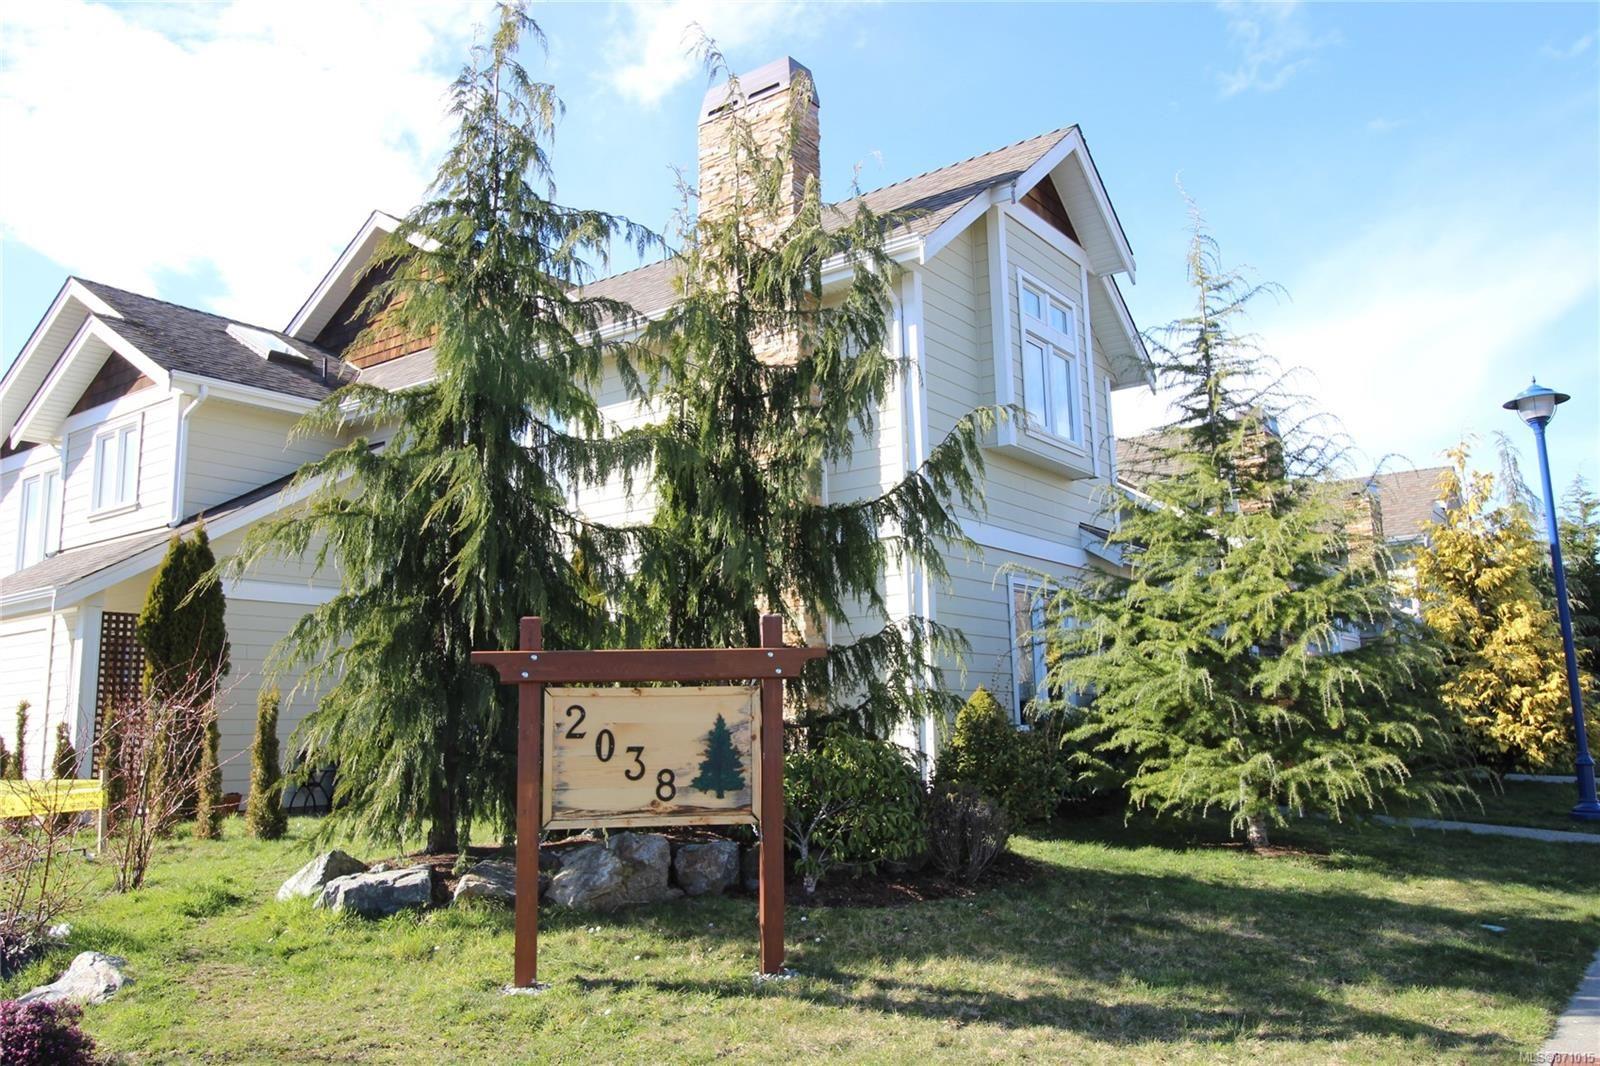 Main Photo: 117 2038 Gatewood Rd in : Sk Sooke Vill Core Row/Townhouse for sale (Sooke)  : MLS®# 871015